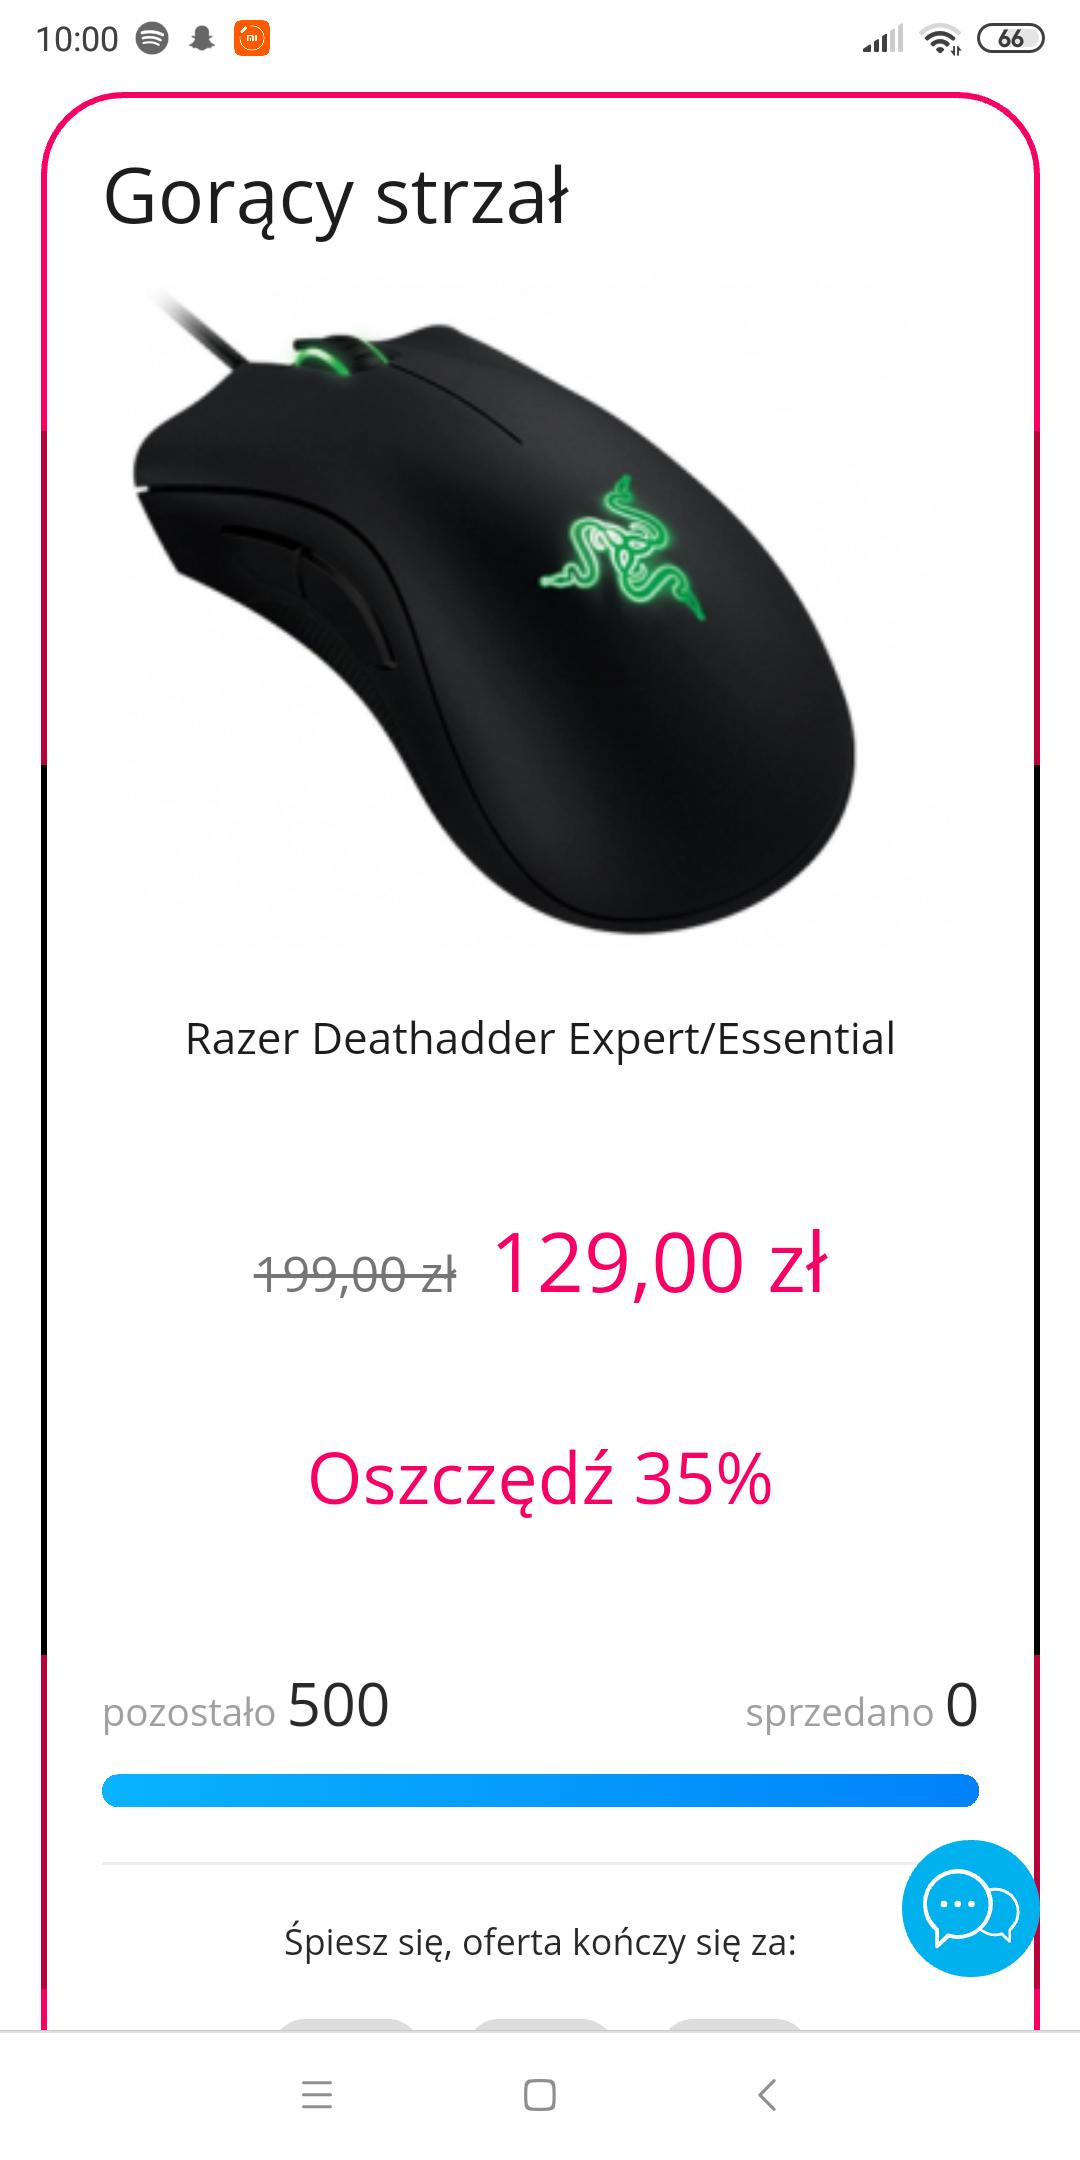 Razer Deathadder Expert/Essential Gorący Strzał x-kom